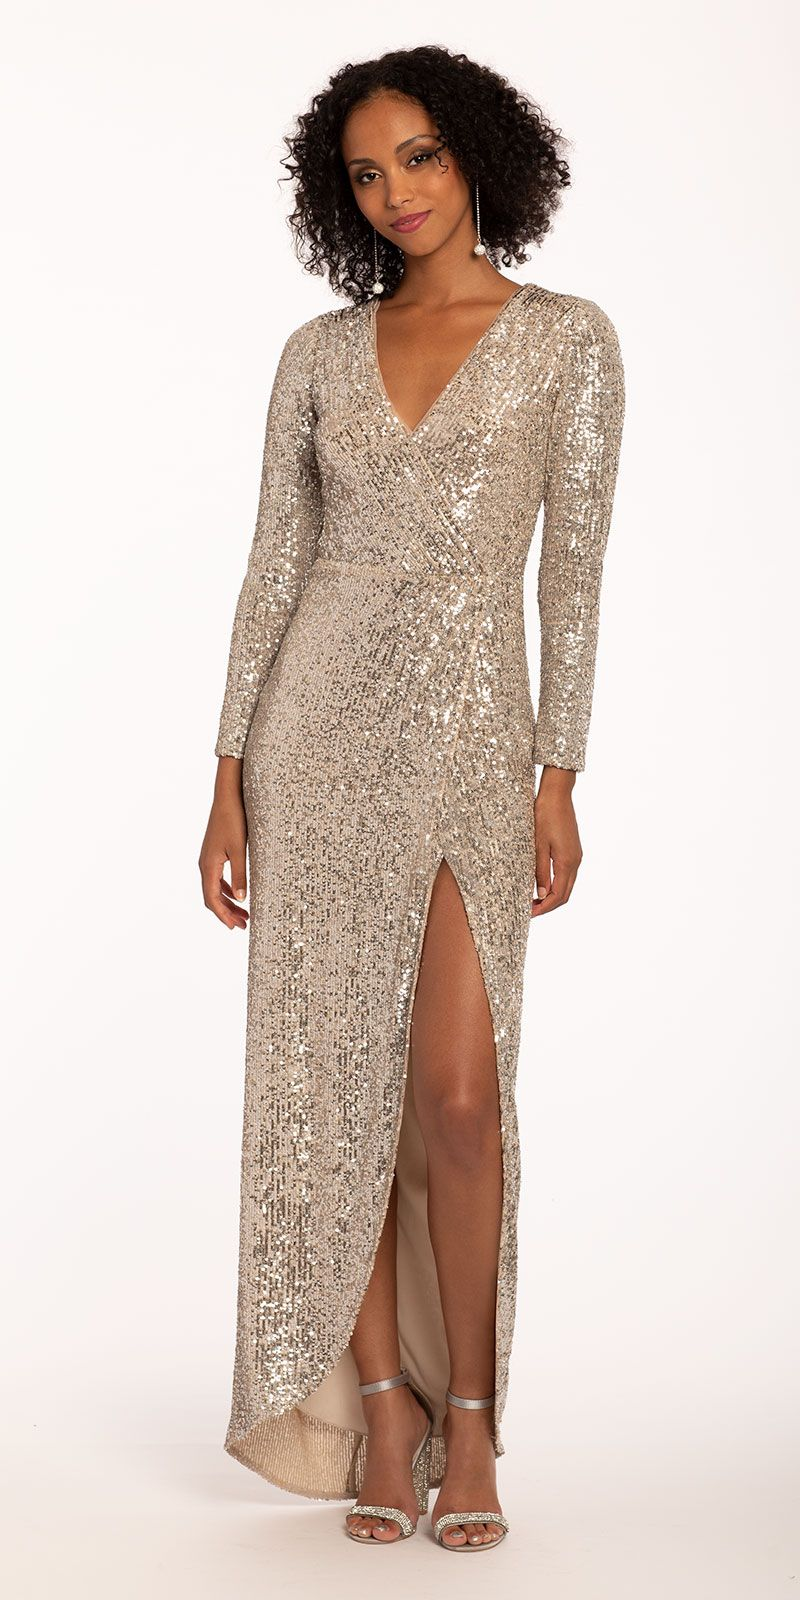 Long Sleeve Surplice All Over Sequin Dress Dresses Sequin Dress Long Sleeve Sequin [ 1600 x 800 Pixel ]